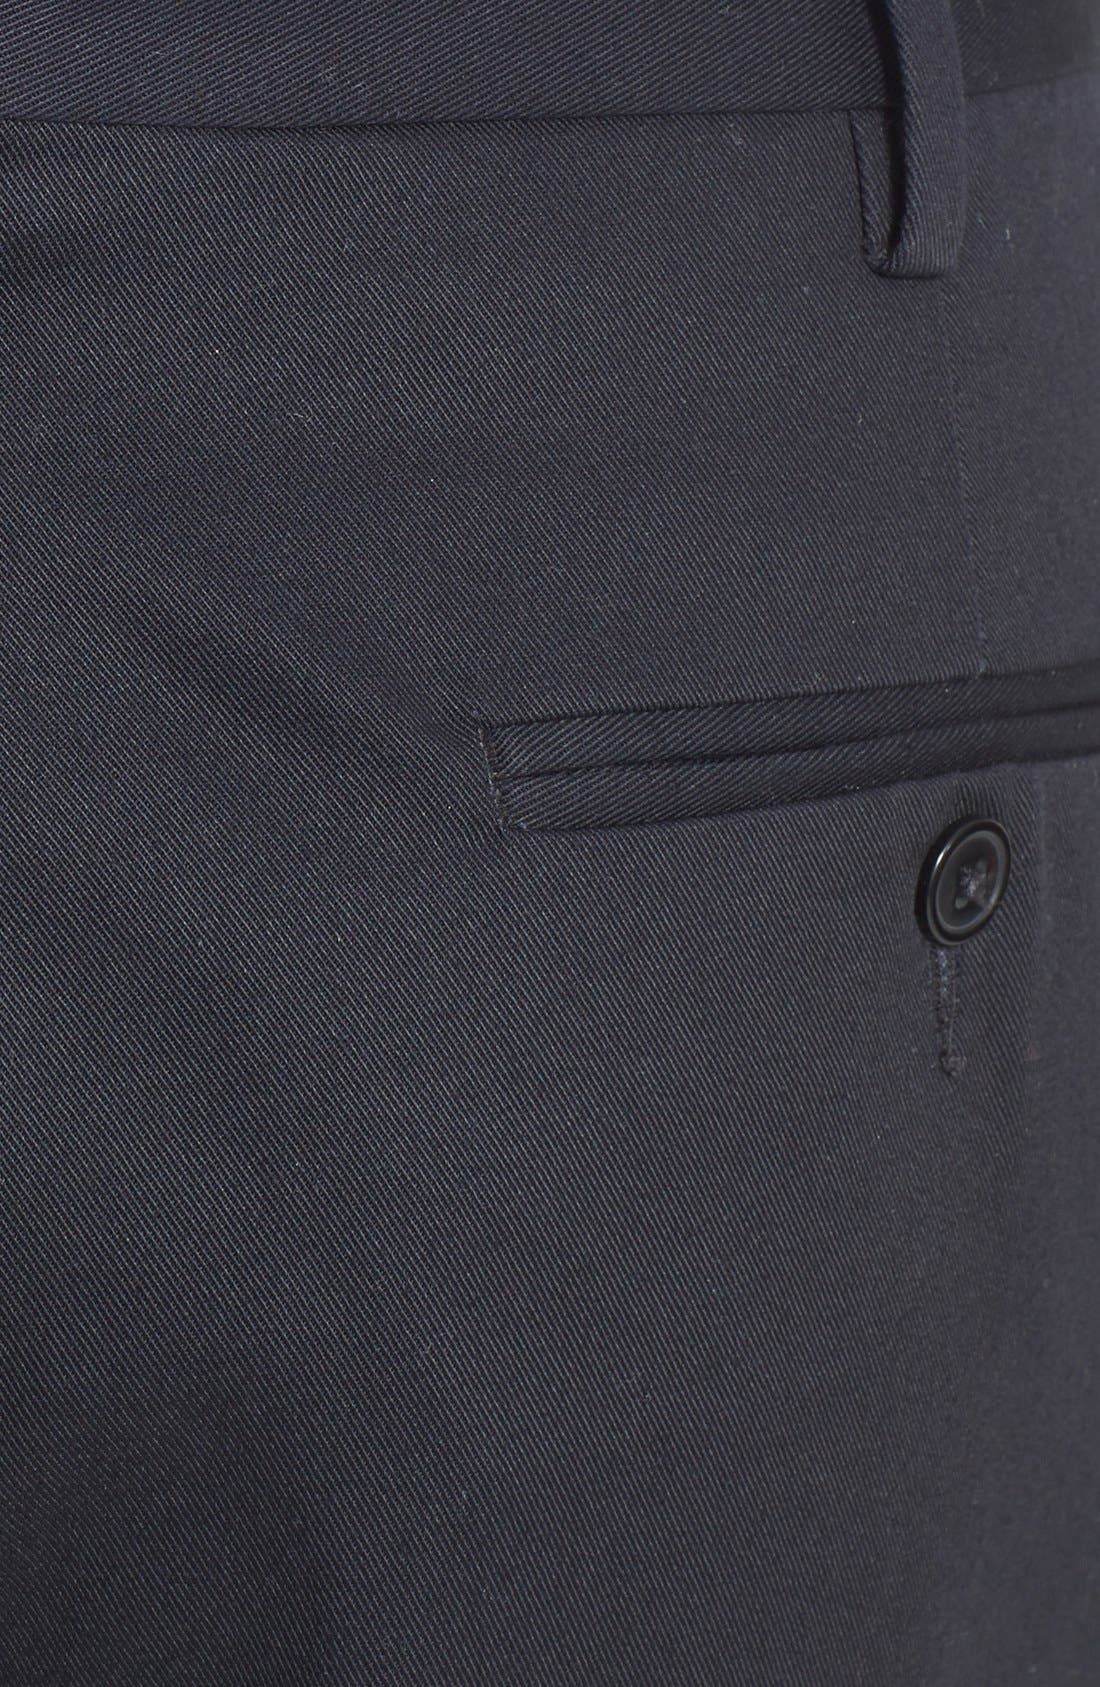 Pleated Cotton Trousers,                             Alternate thumbnail 6, color,                             BLACK